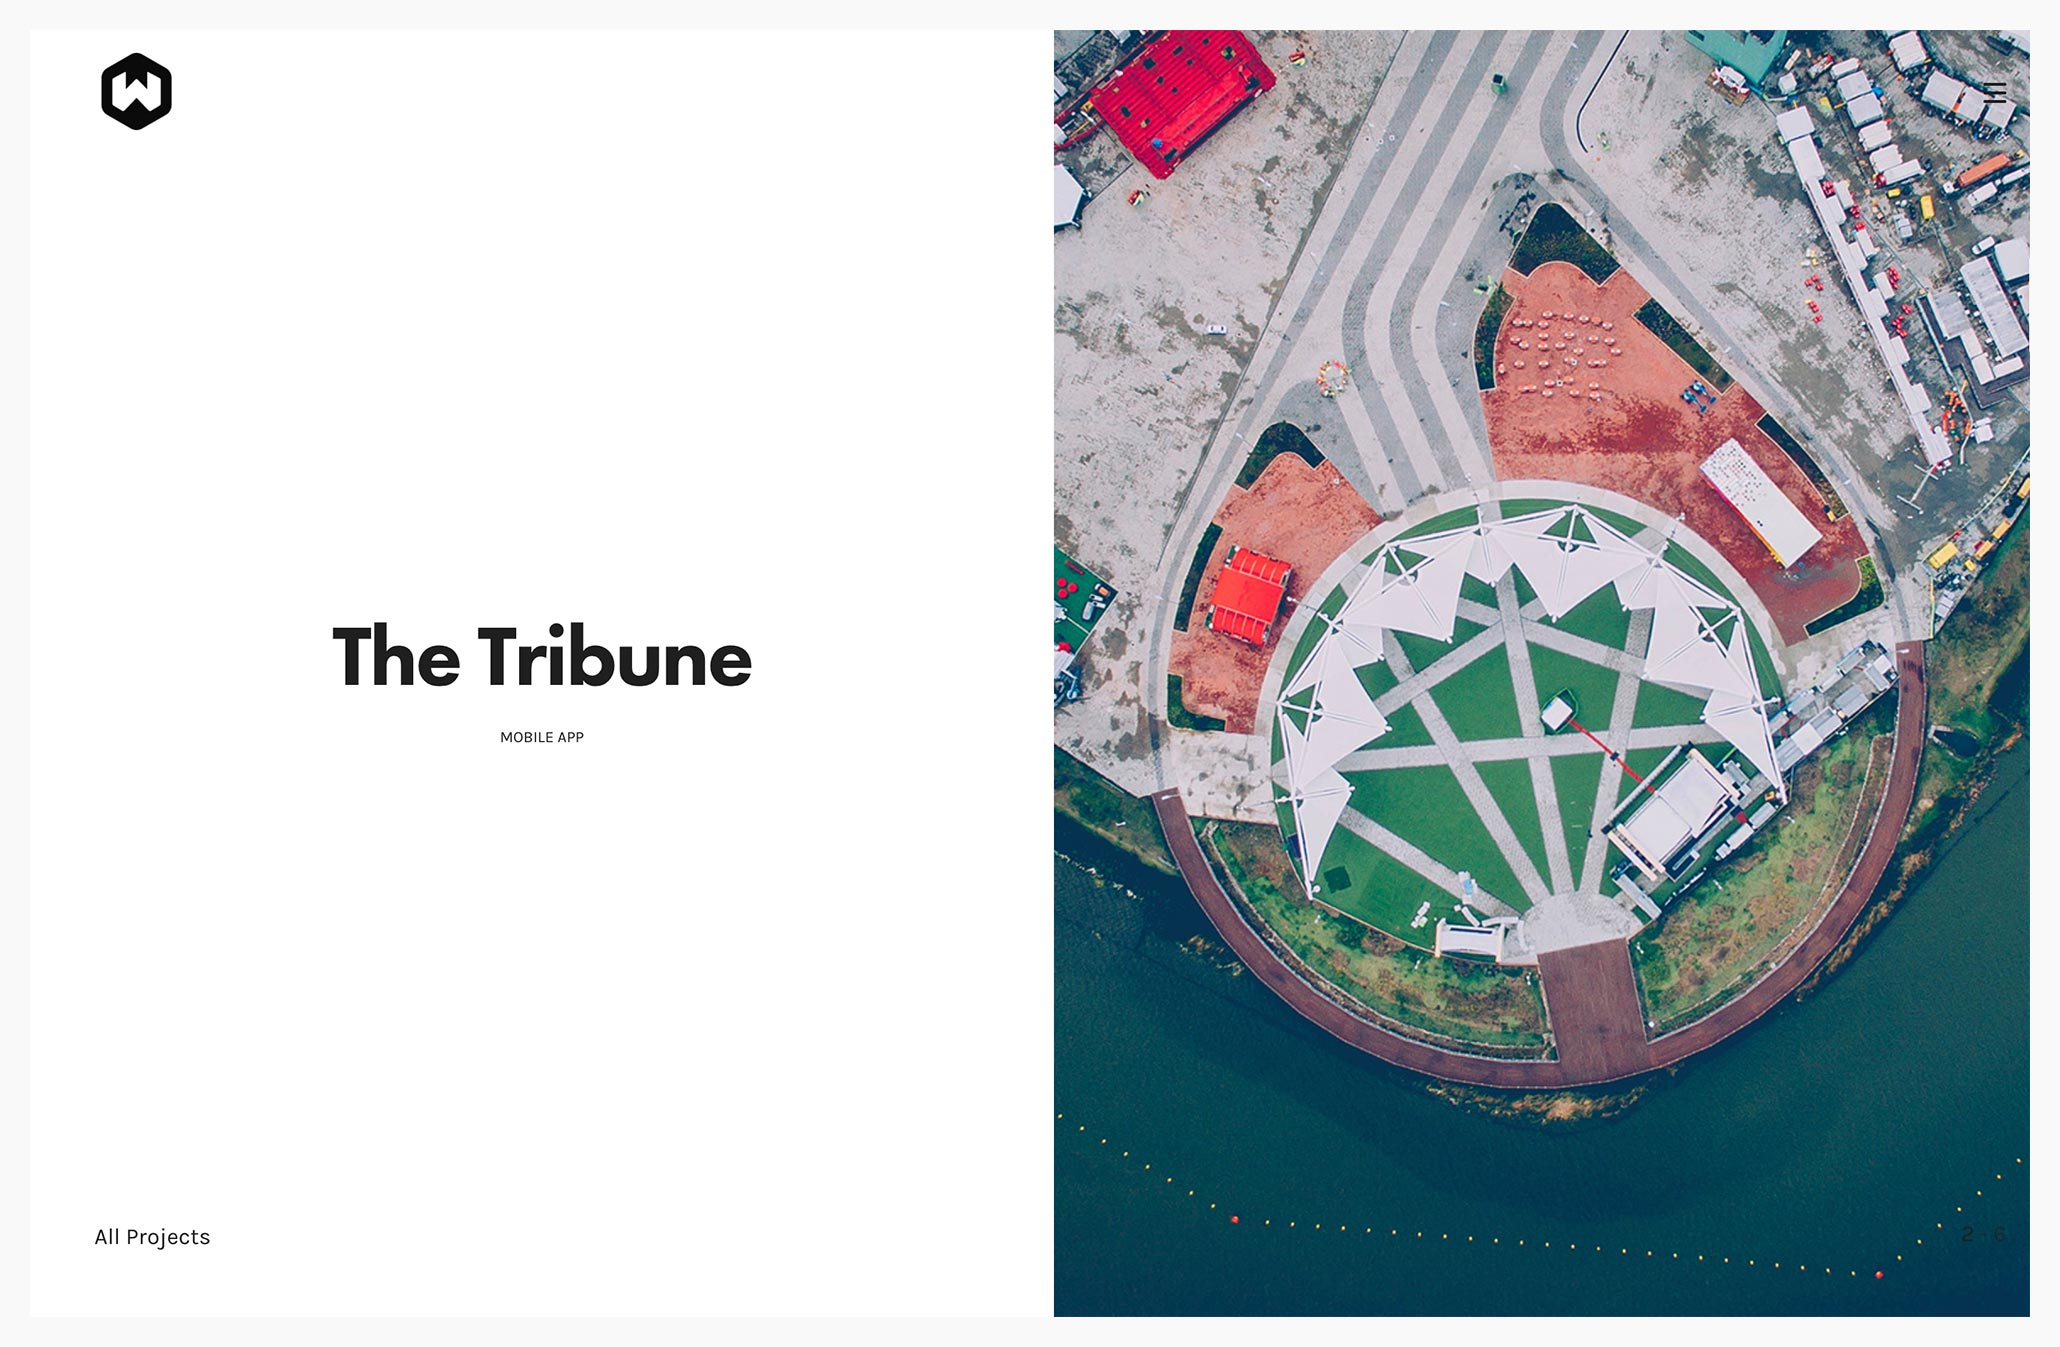 Werkstatt - Best WordPress Themes for Architects